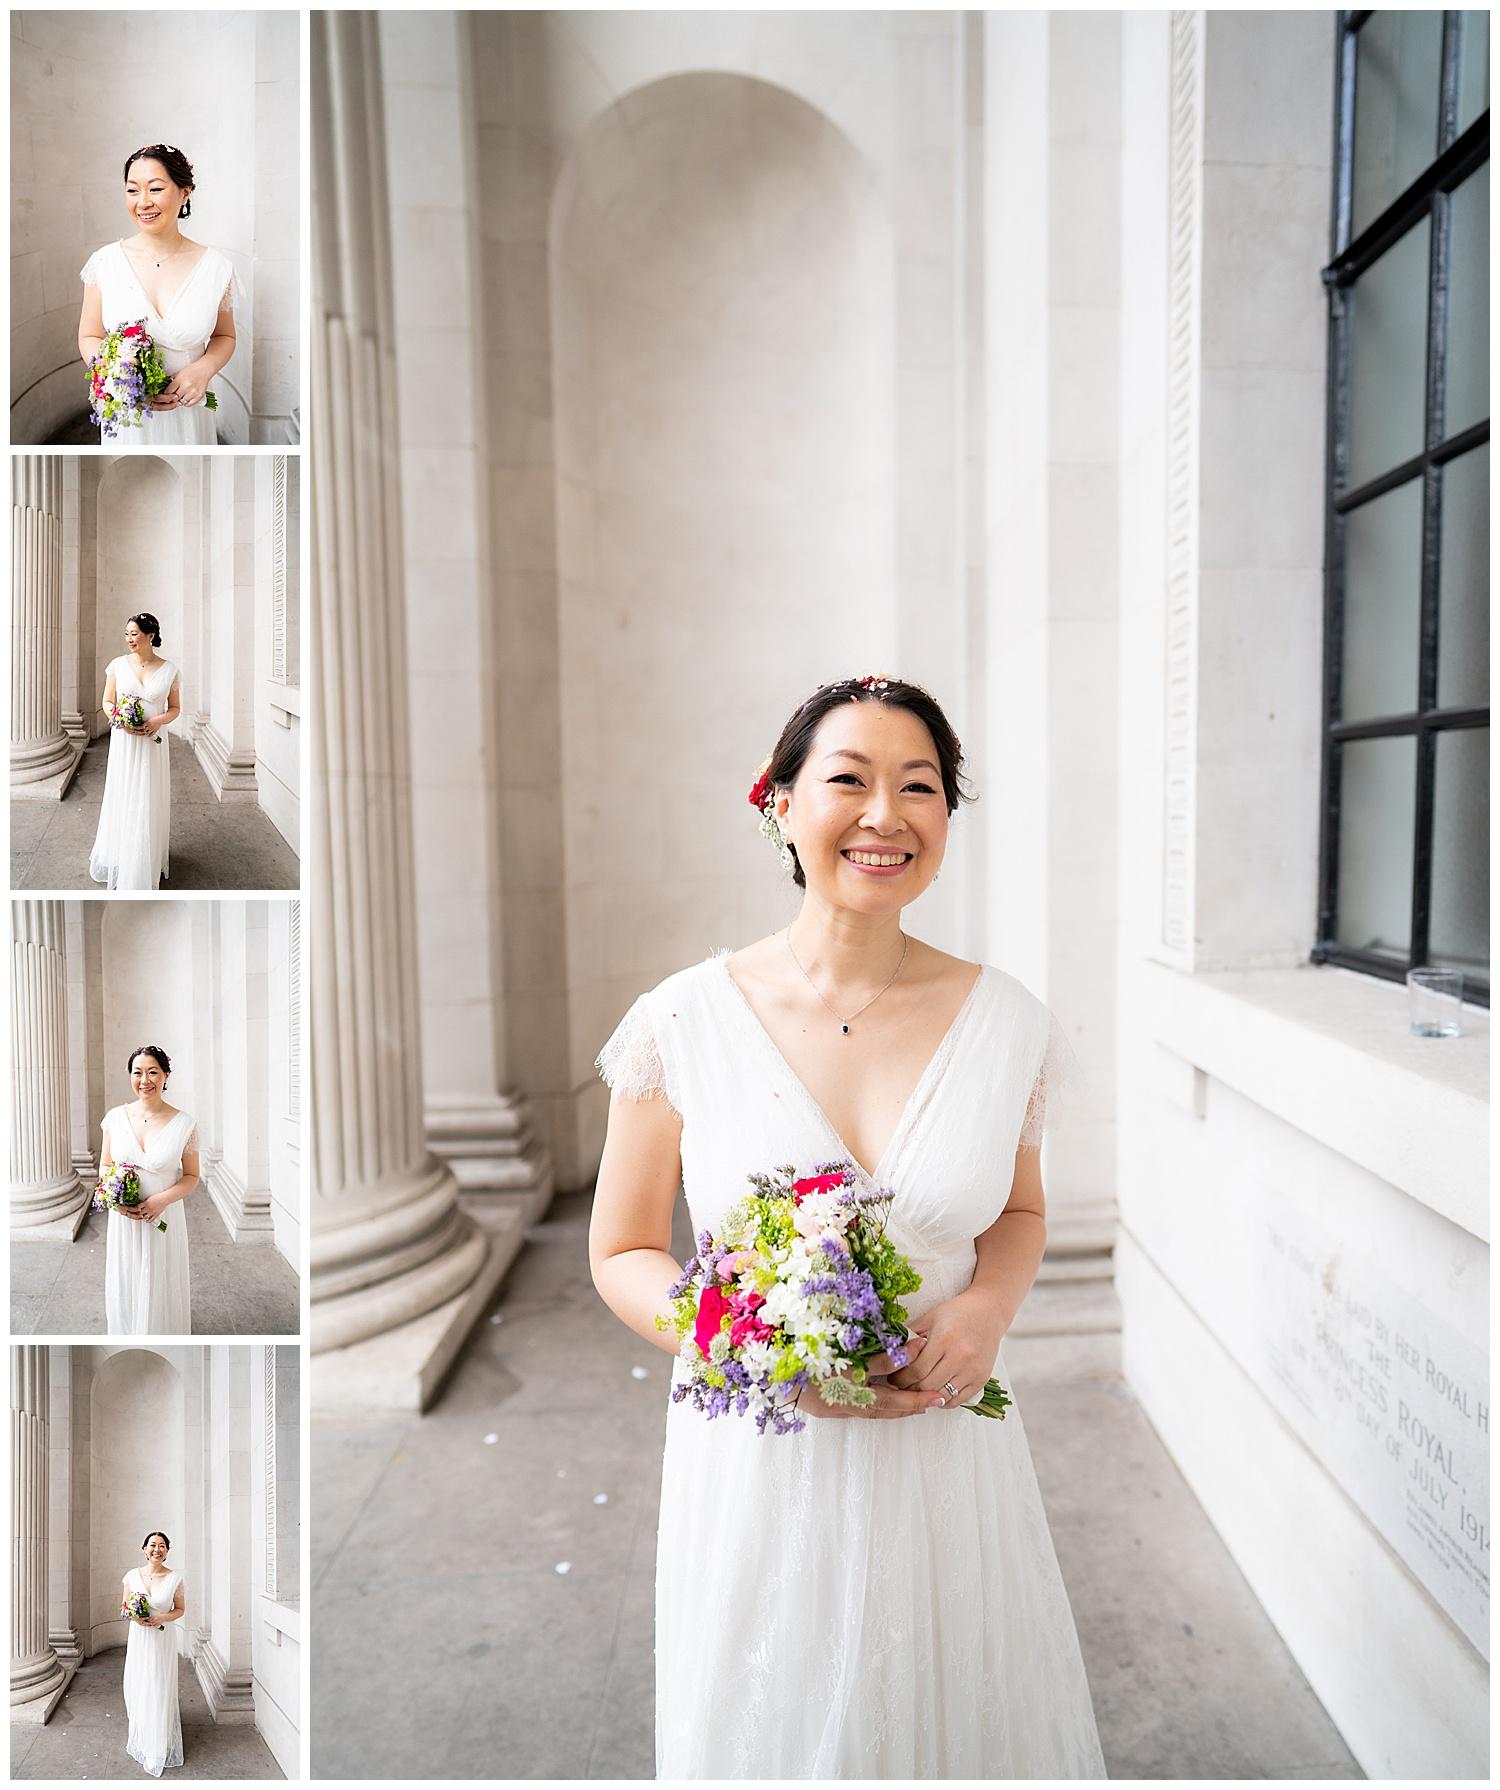 marylebone-town-hall-wedding-21.jpg